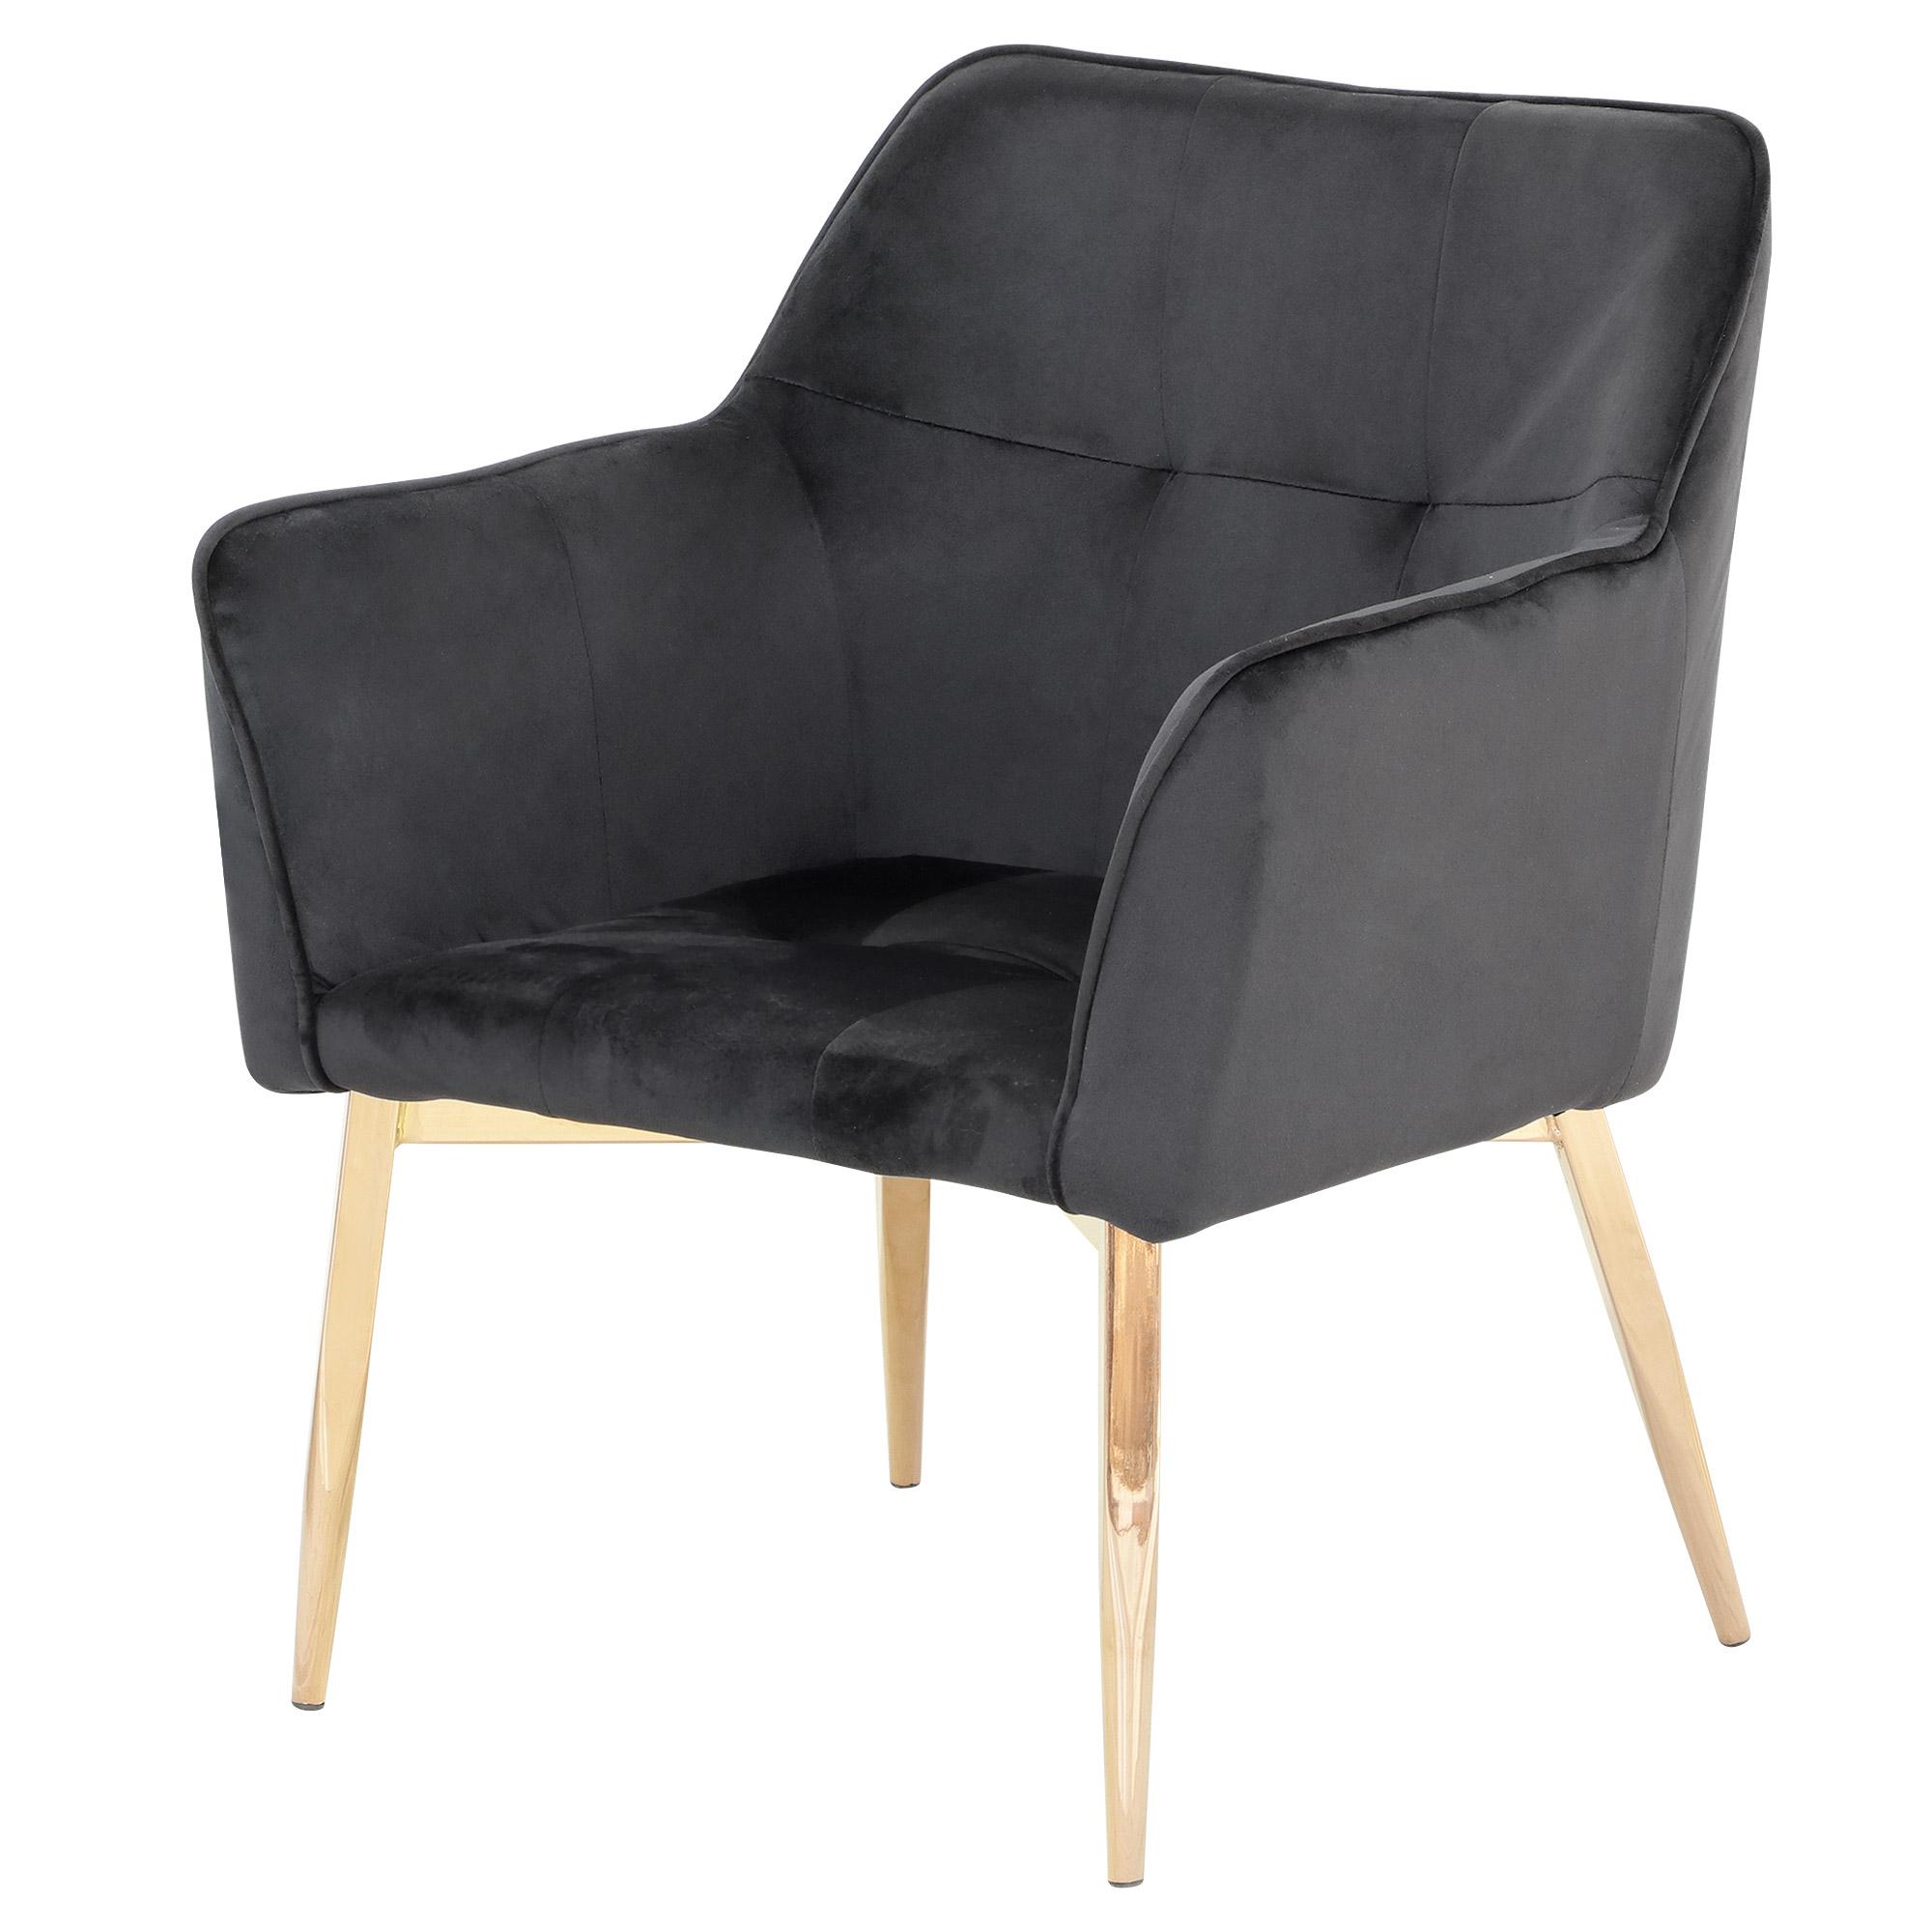 Кресло Shengfang Грейс синее 61х61х78 см кресло liyasi руби синее 76x76x78 см